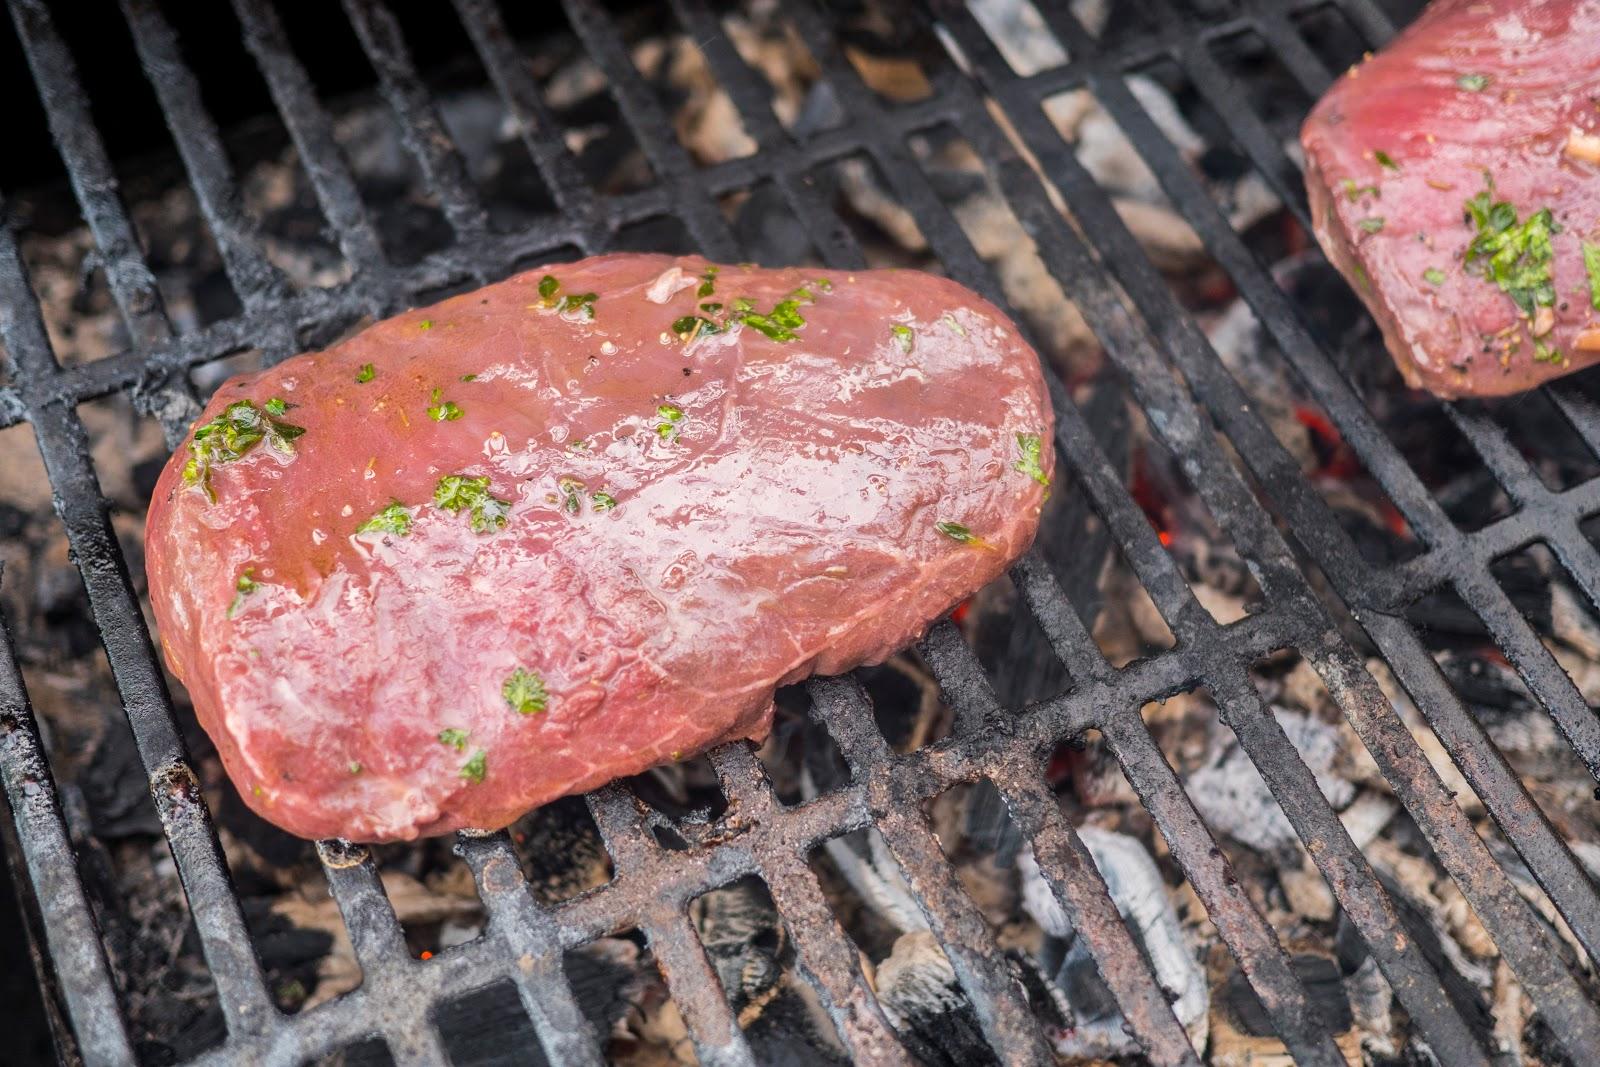 flank_steak_grillissa25cc2588_2-1